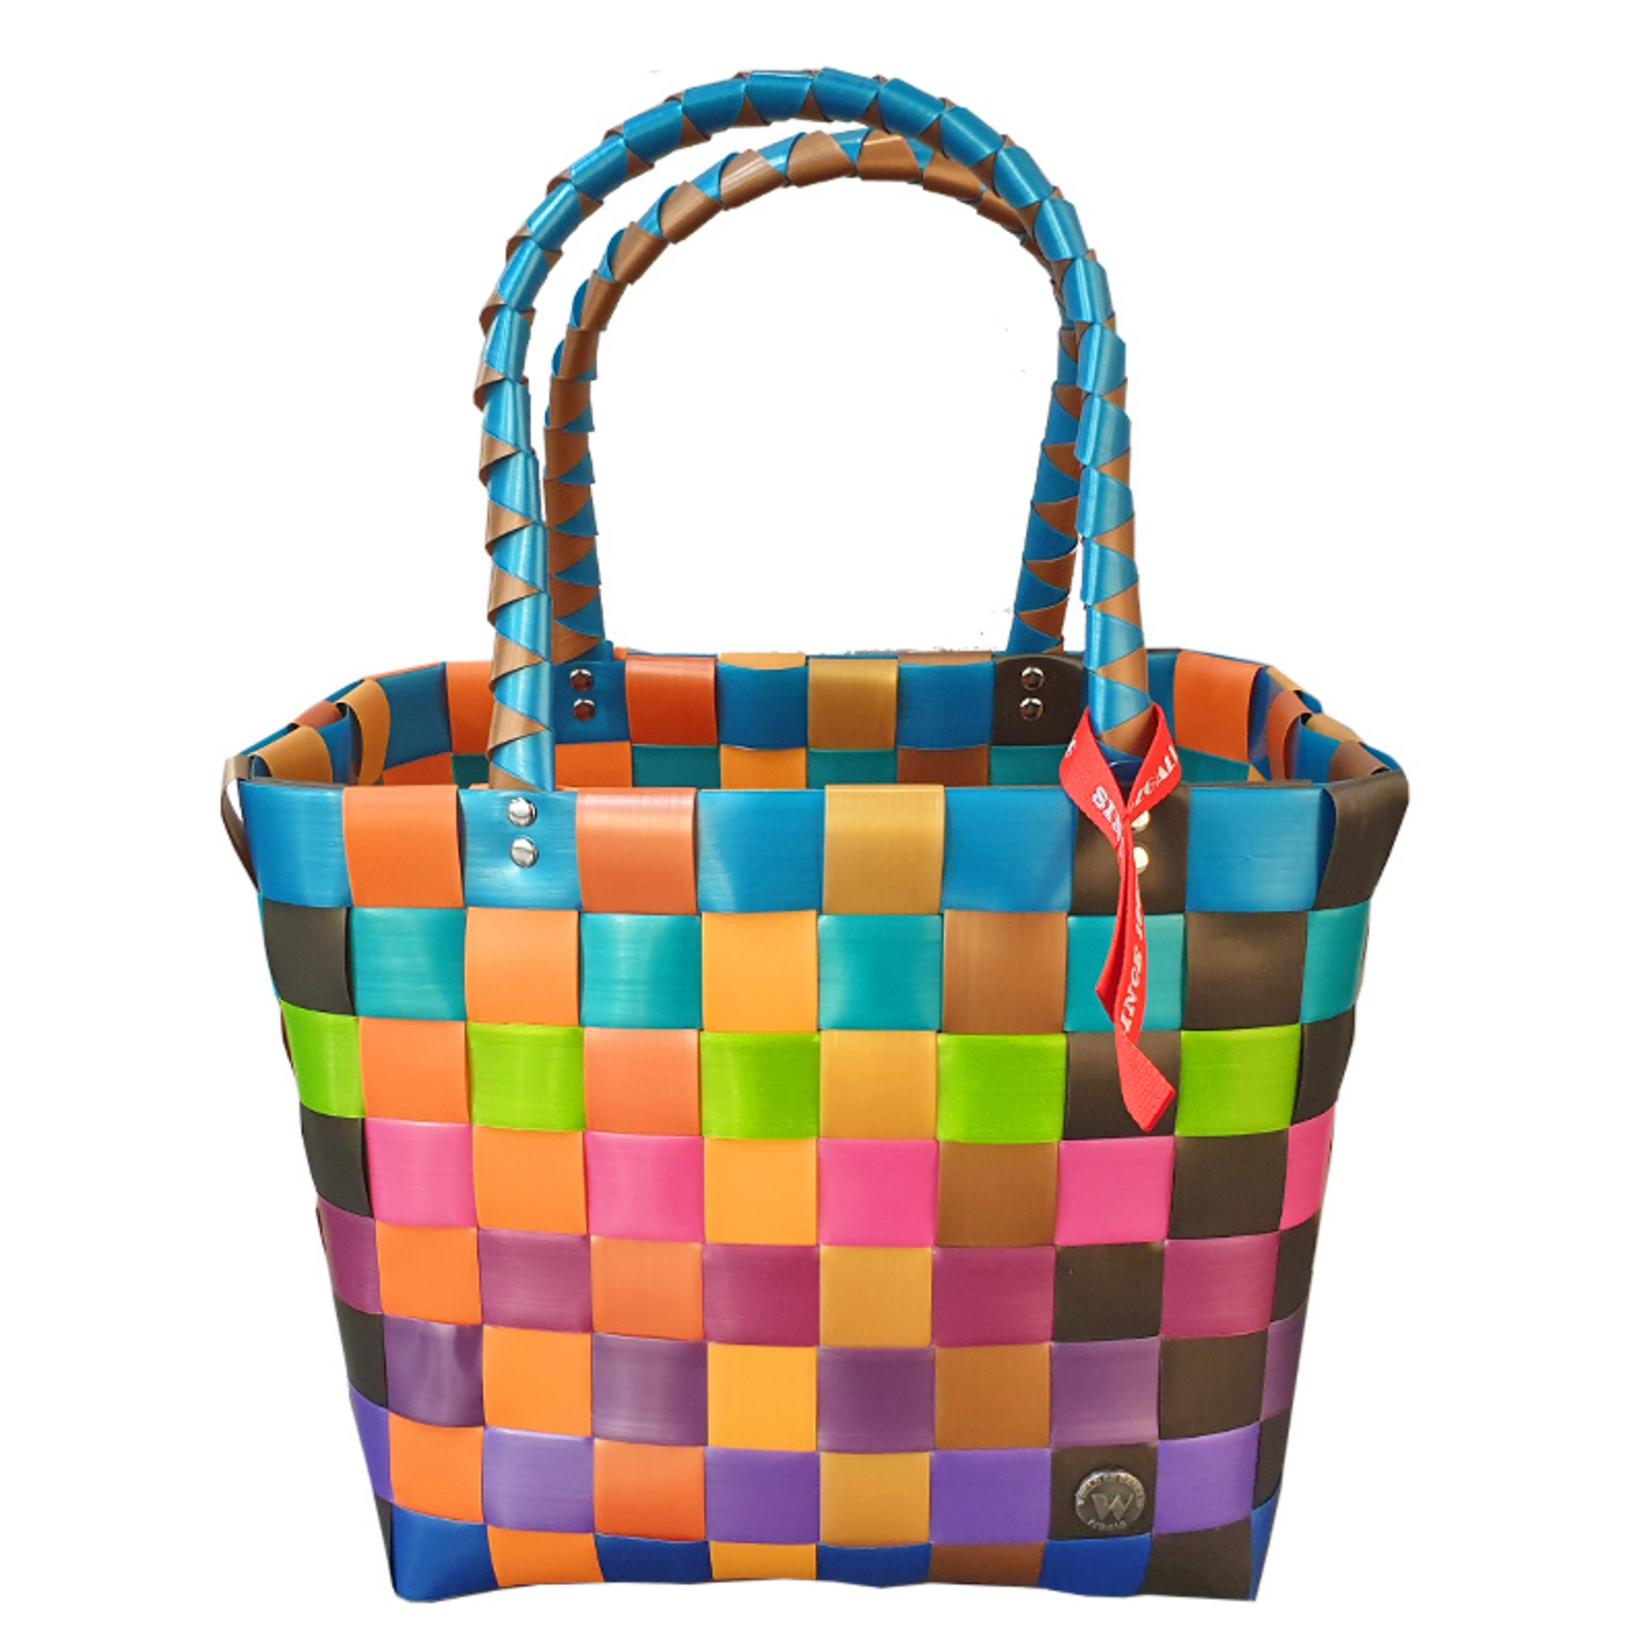 ICE BAG Taschen ICE BAG Shopper 5009-99   Original Witzgall Tasche   bunt-kariert